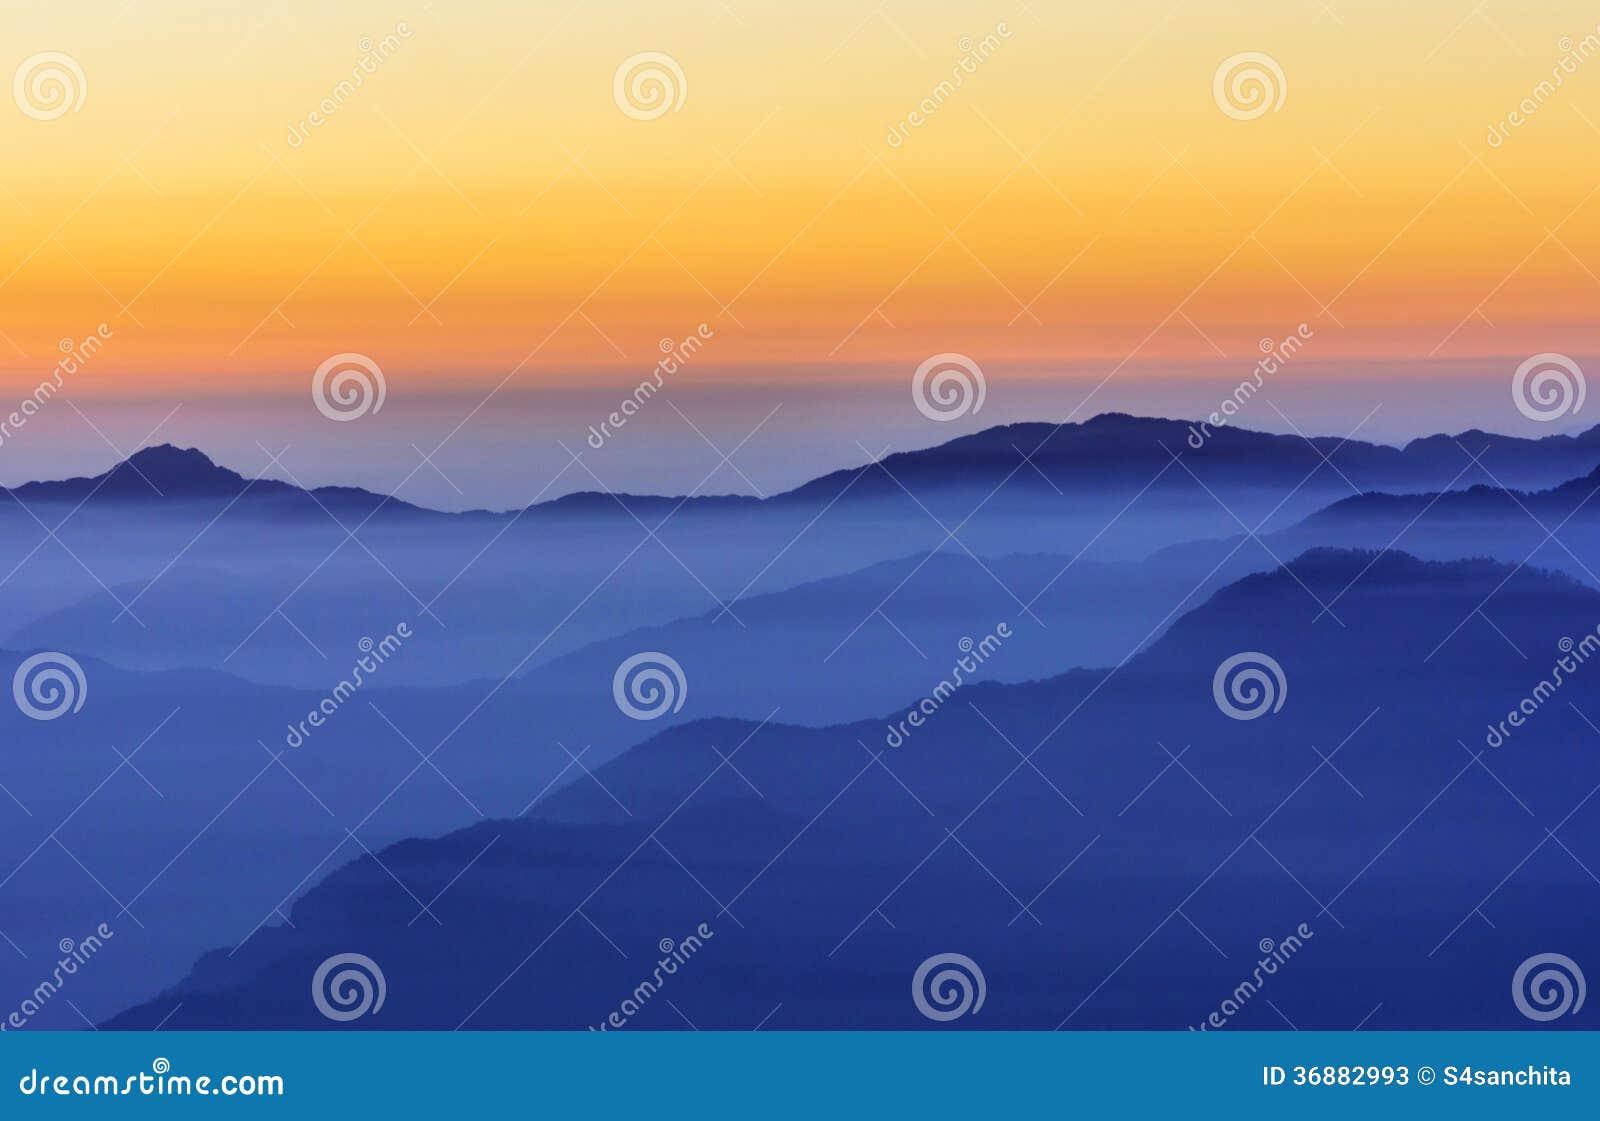 Download Catena di montagna immagine stock. Immagine di himalaya - 36882993